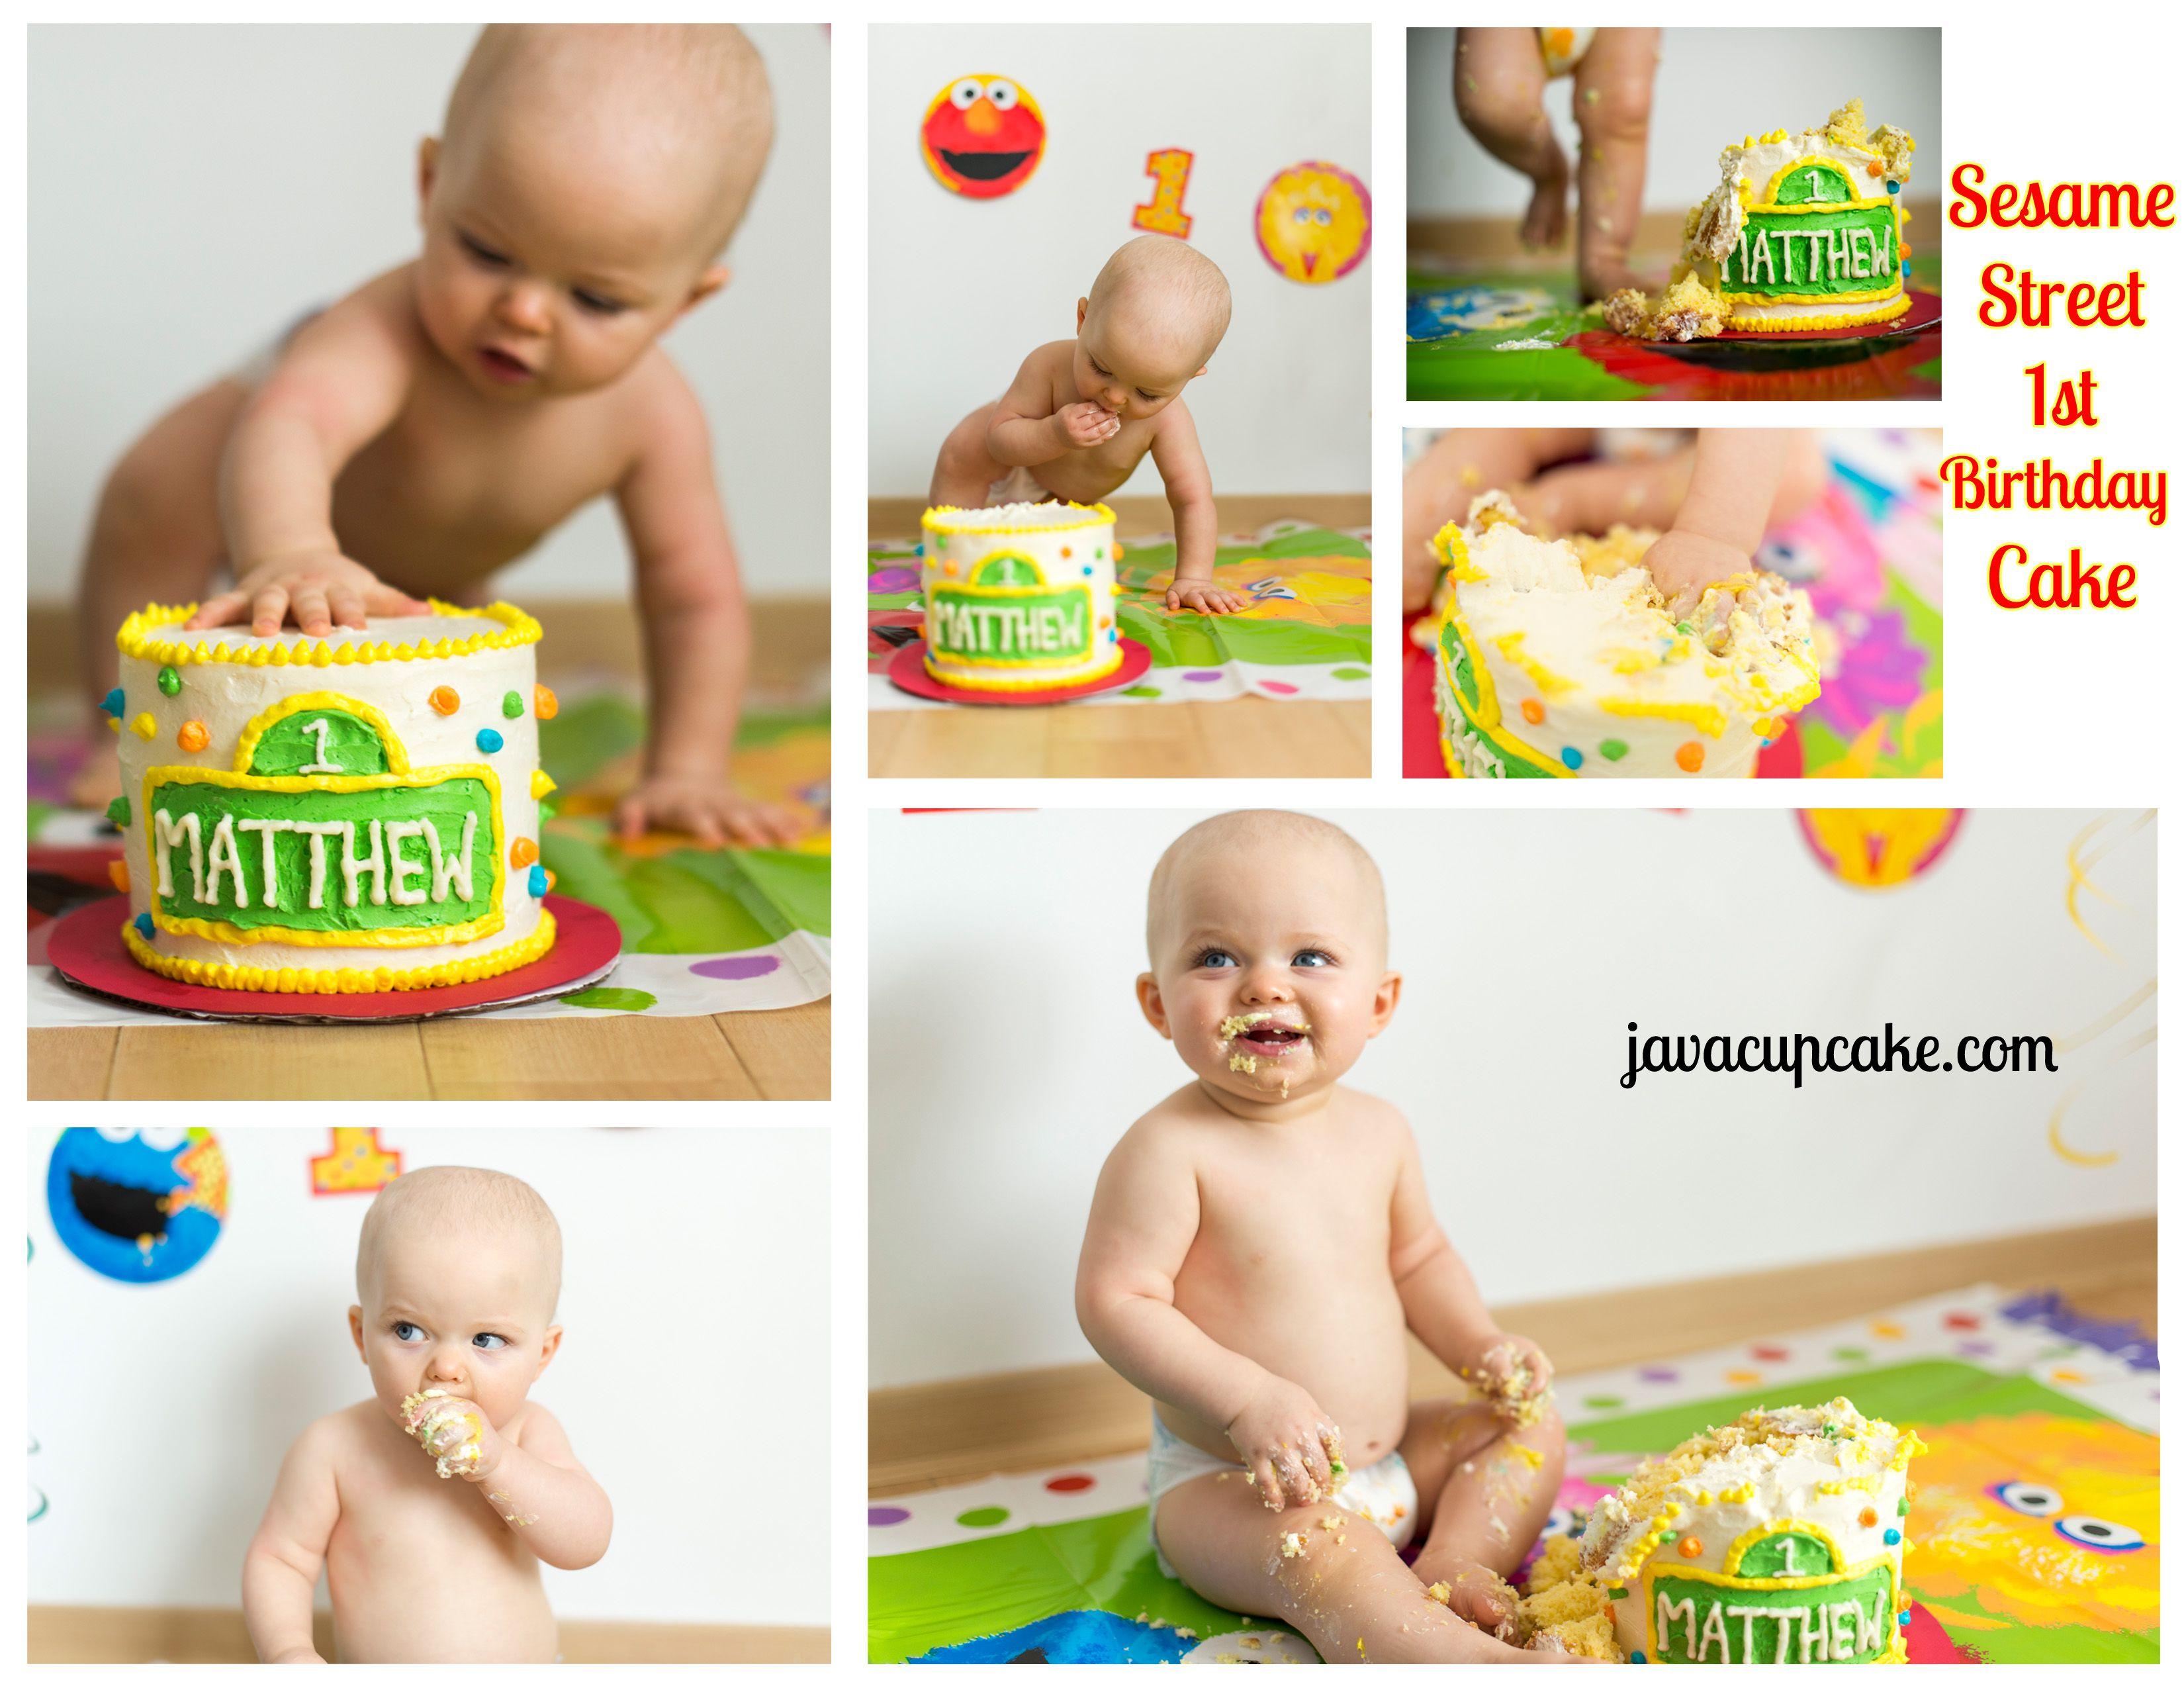 27 best Sesame Street Birthday Party Ideas for Mattys 1st Birthday